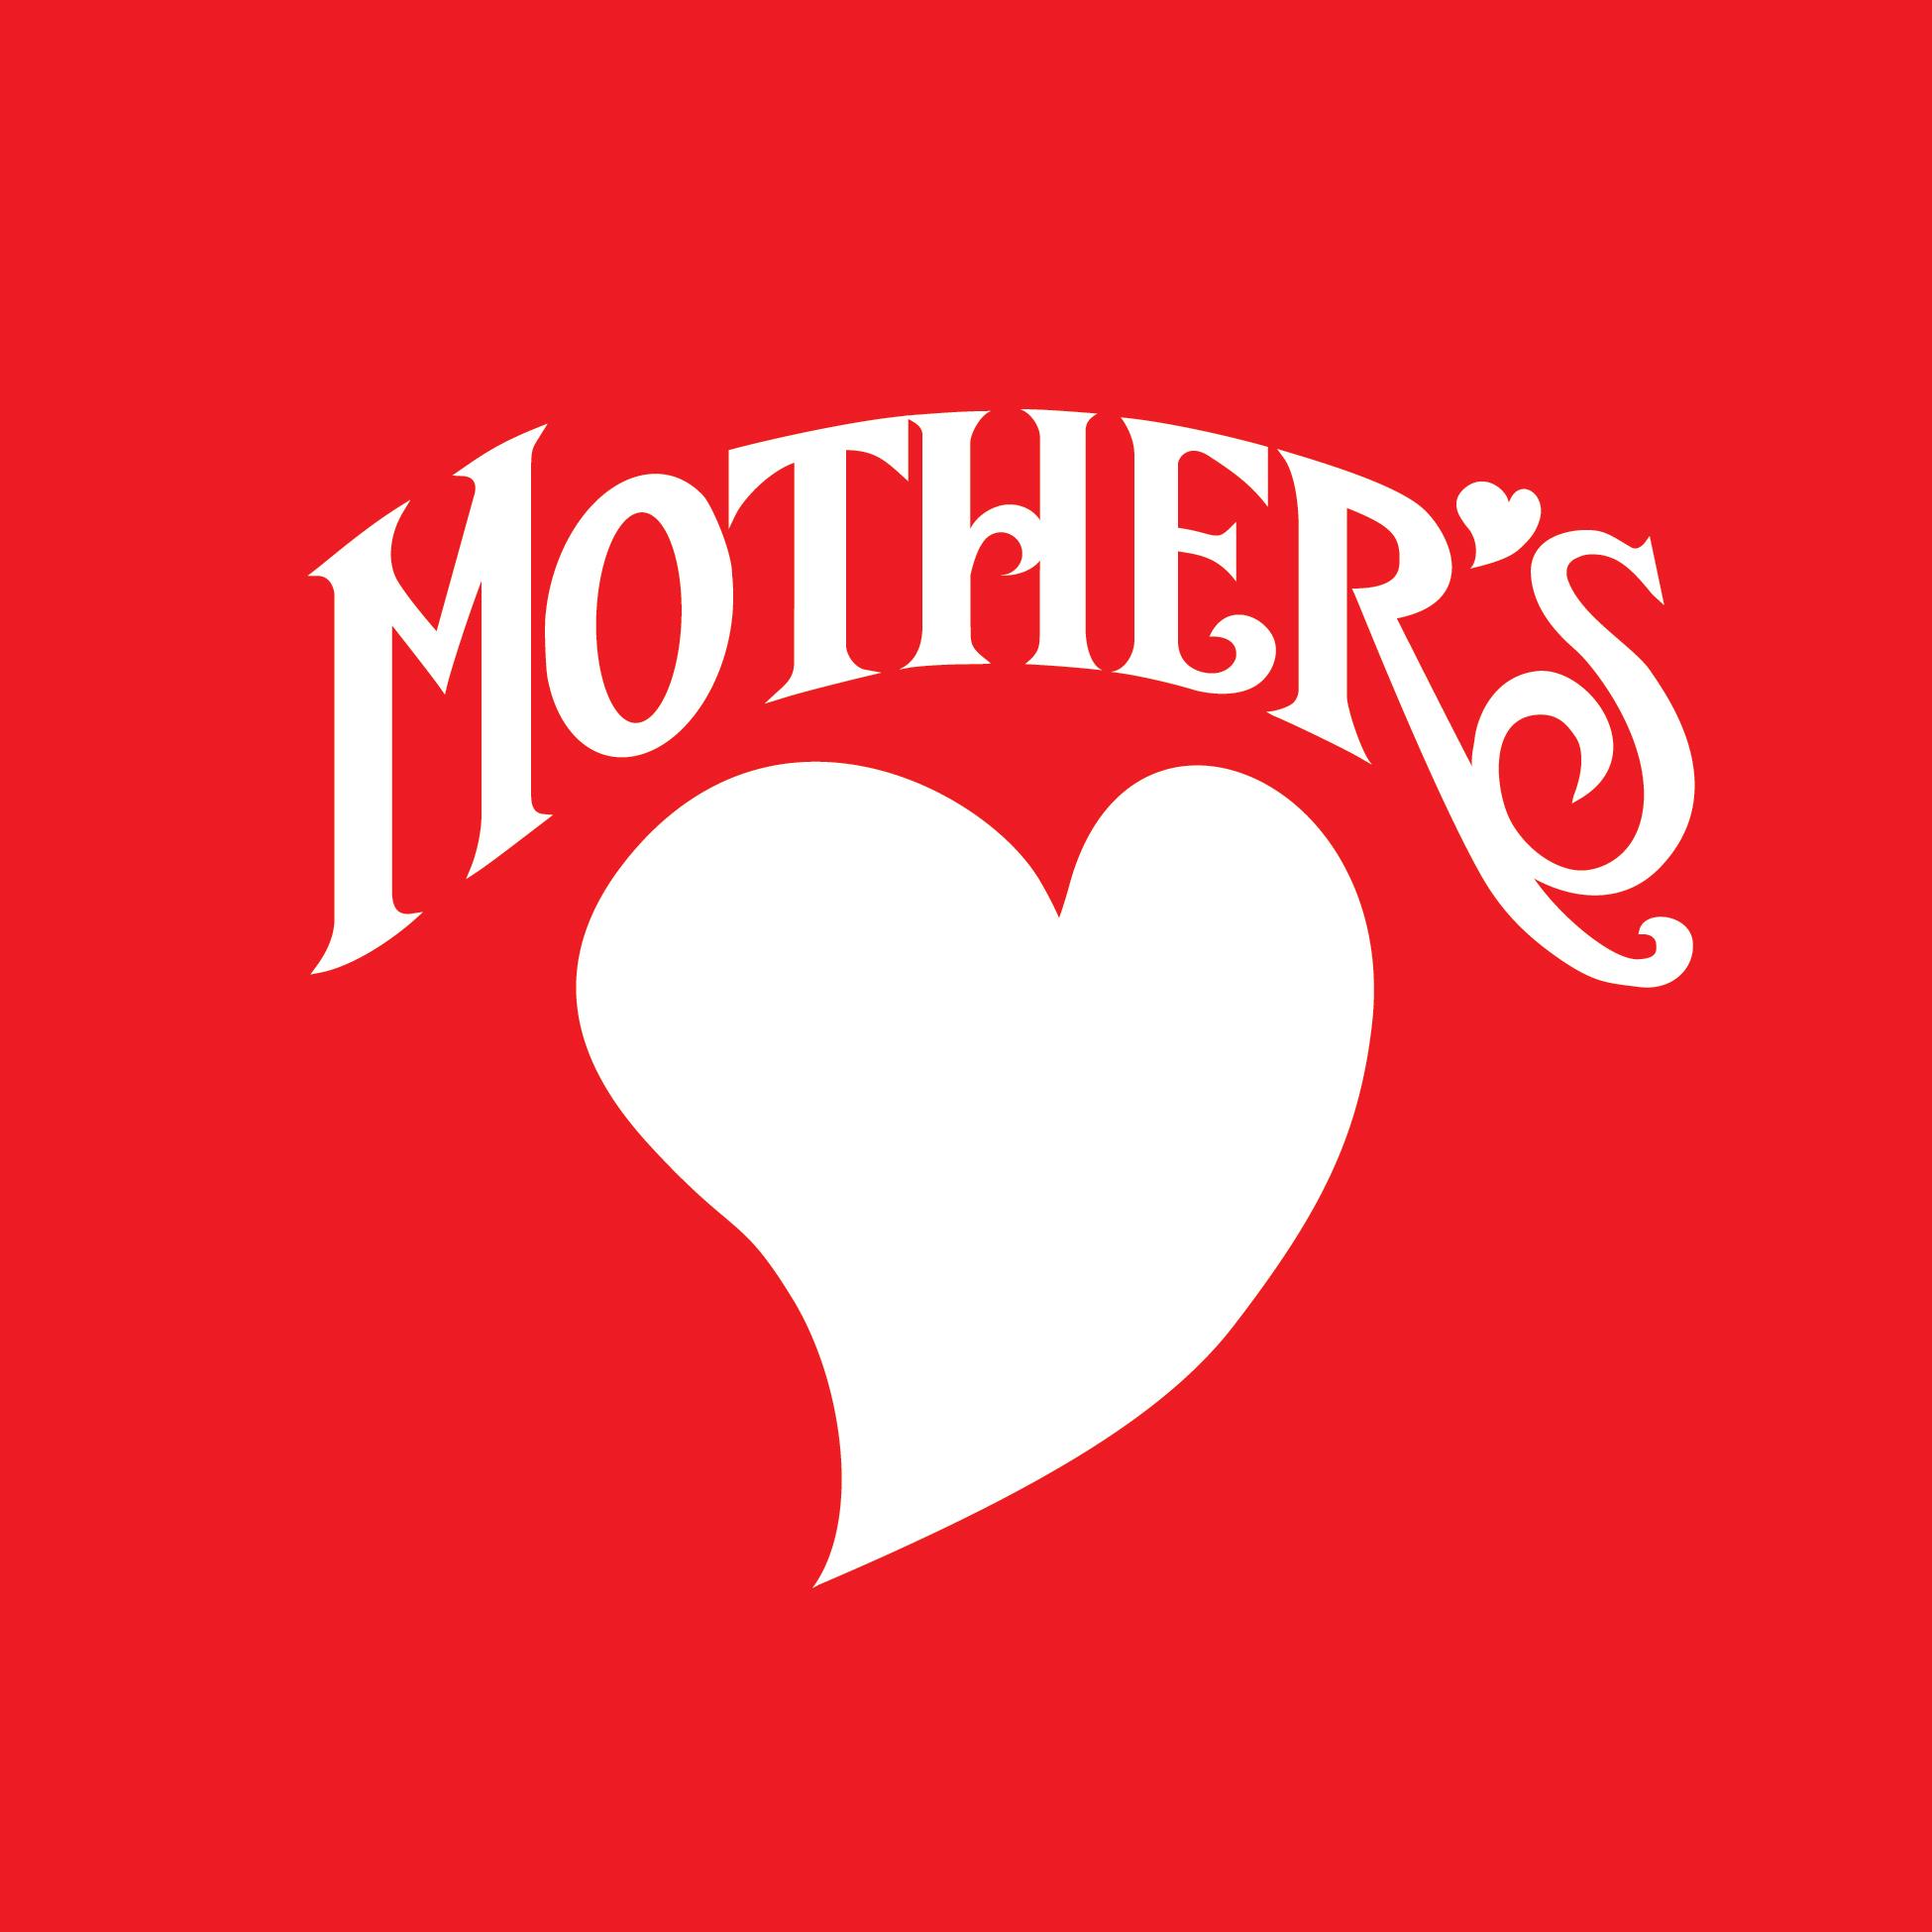 Mother's Market logo